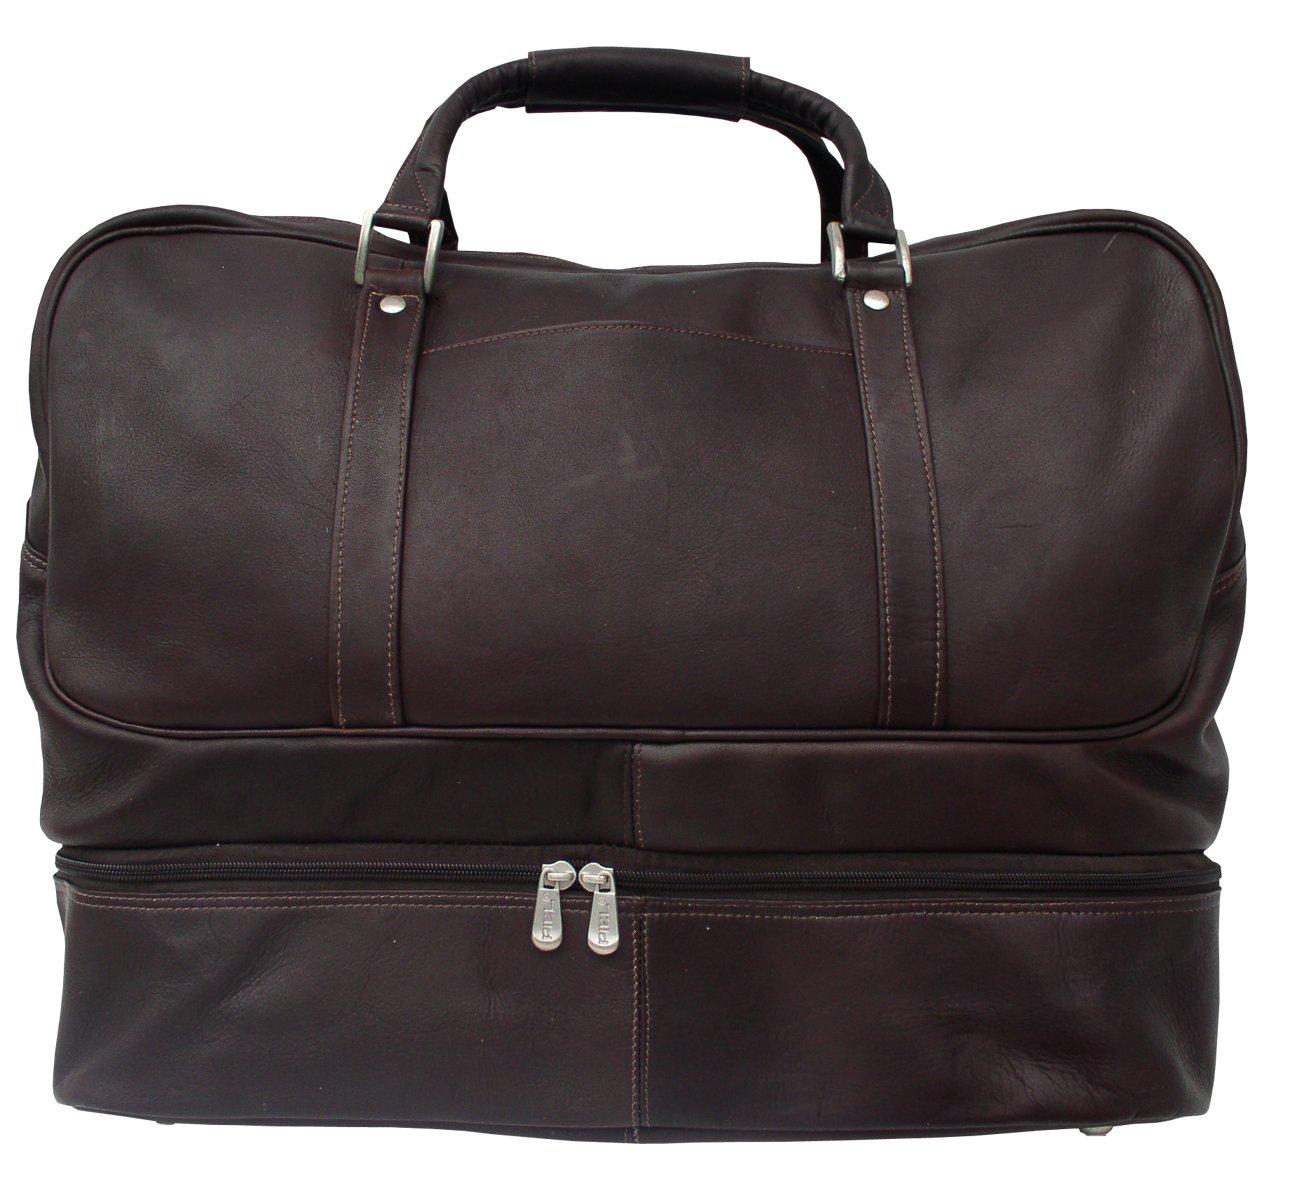 923e41b7073f Piel Leather False-Bottom Sports Bag, Chocolate, One Size